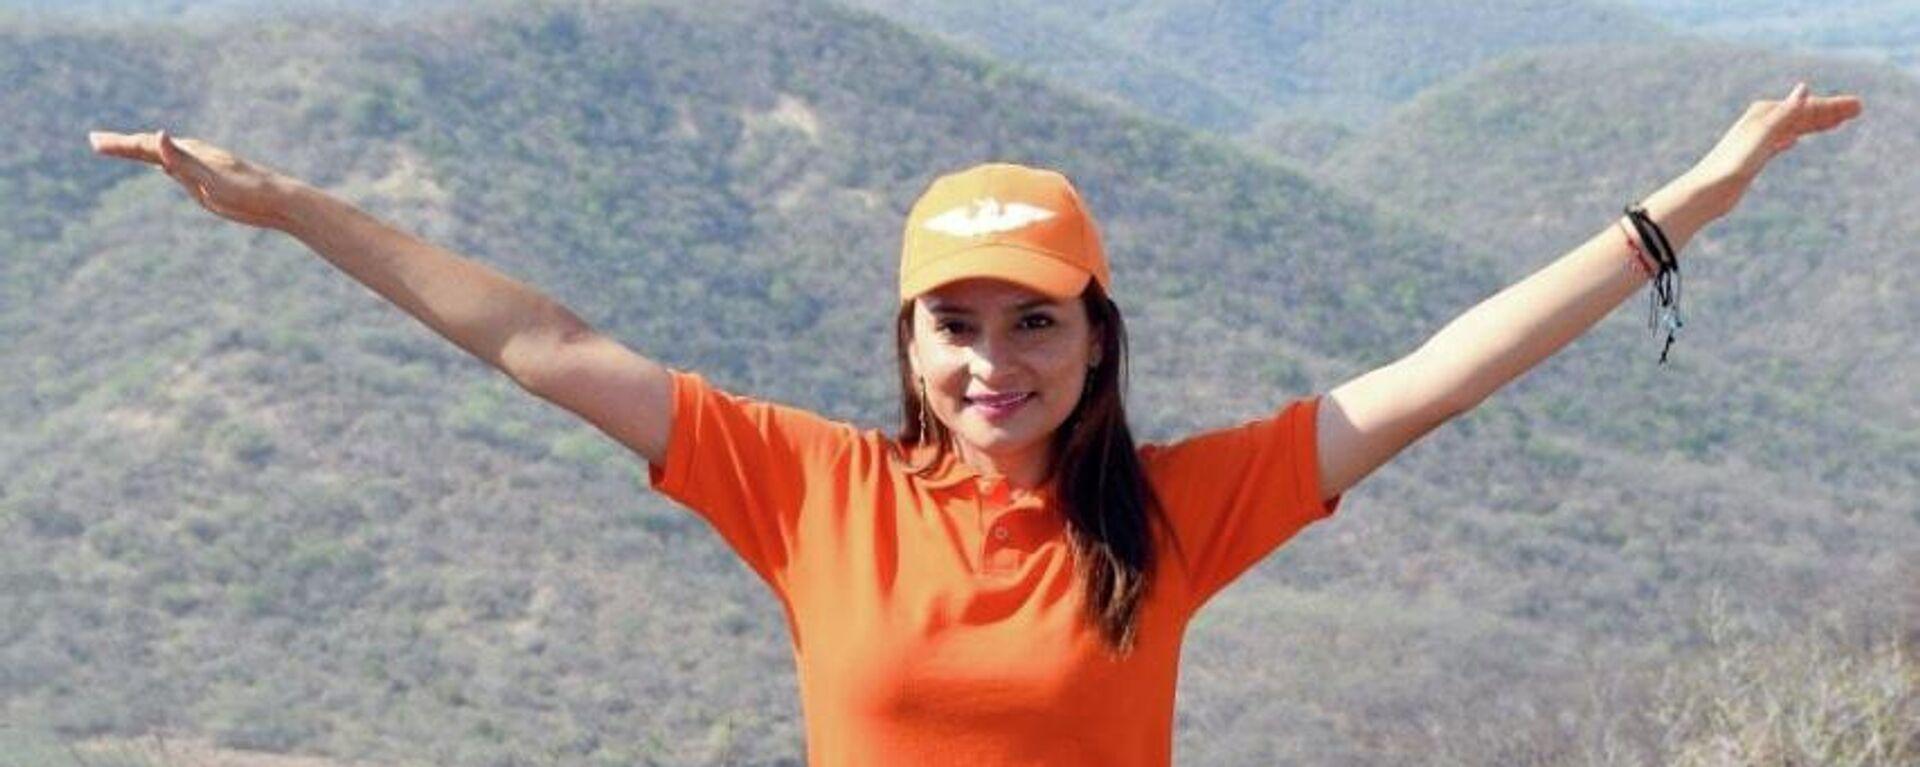 Marilú Martínez Núñez, candidata a alcalde de la población mexicana Cutzamala de Pinzón - Sputnik Mundo, 1920, 02.06.2021